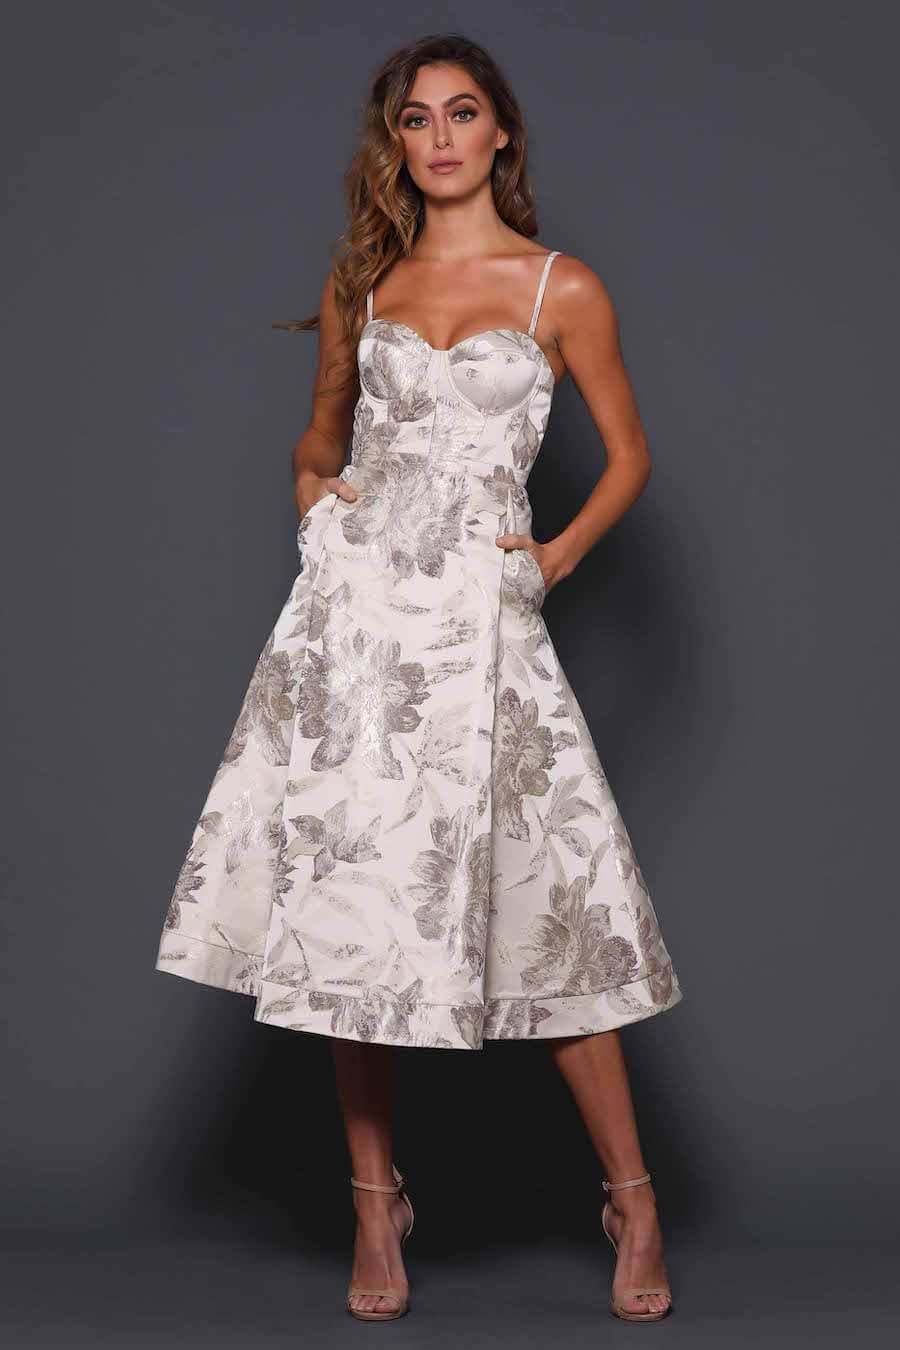 Gold print A-line tea length dress with pockets